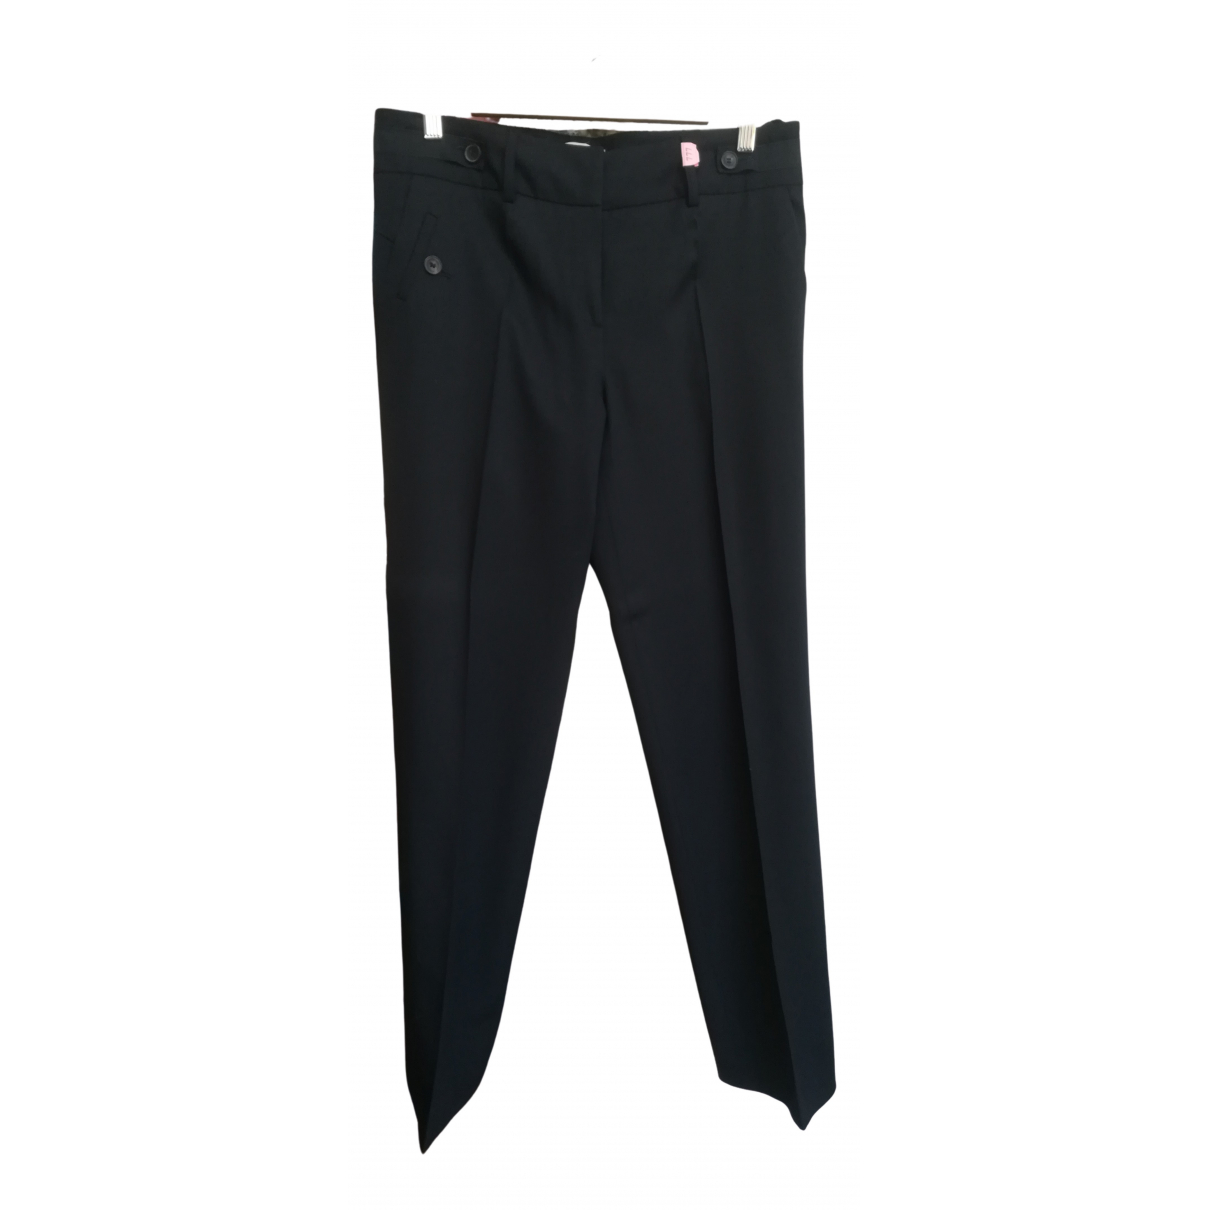 Pantalon recto de Lana Gerard Darel